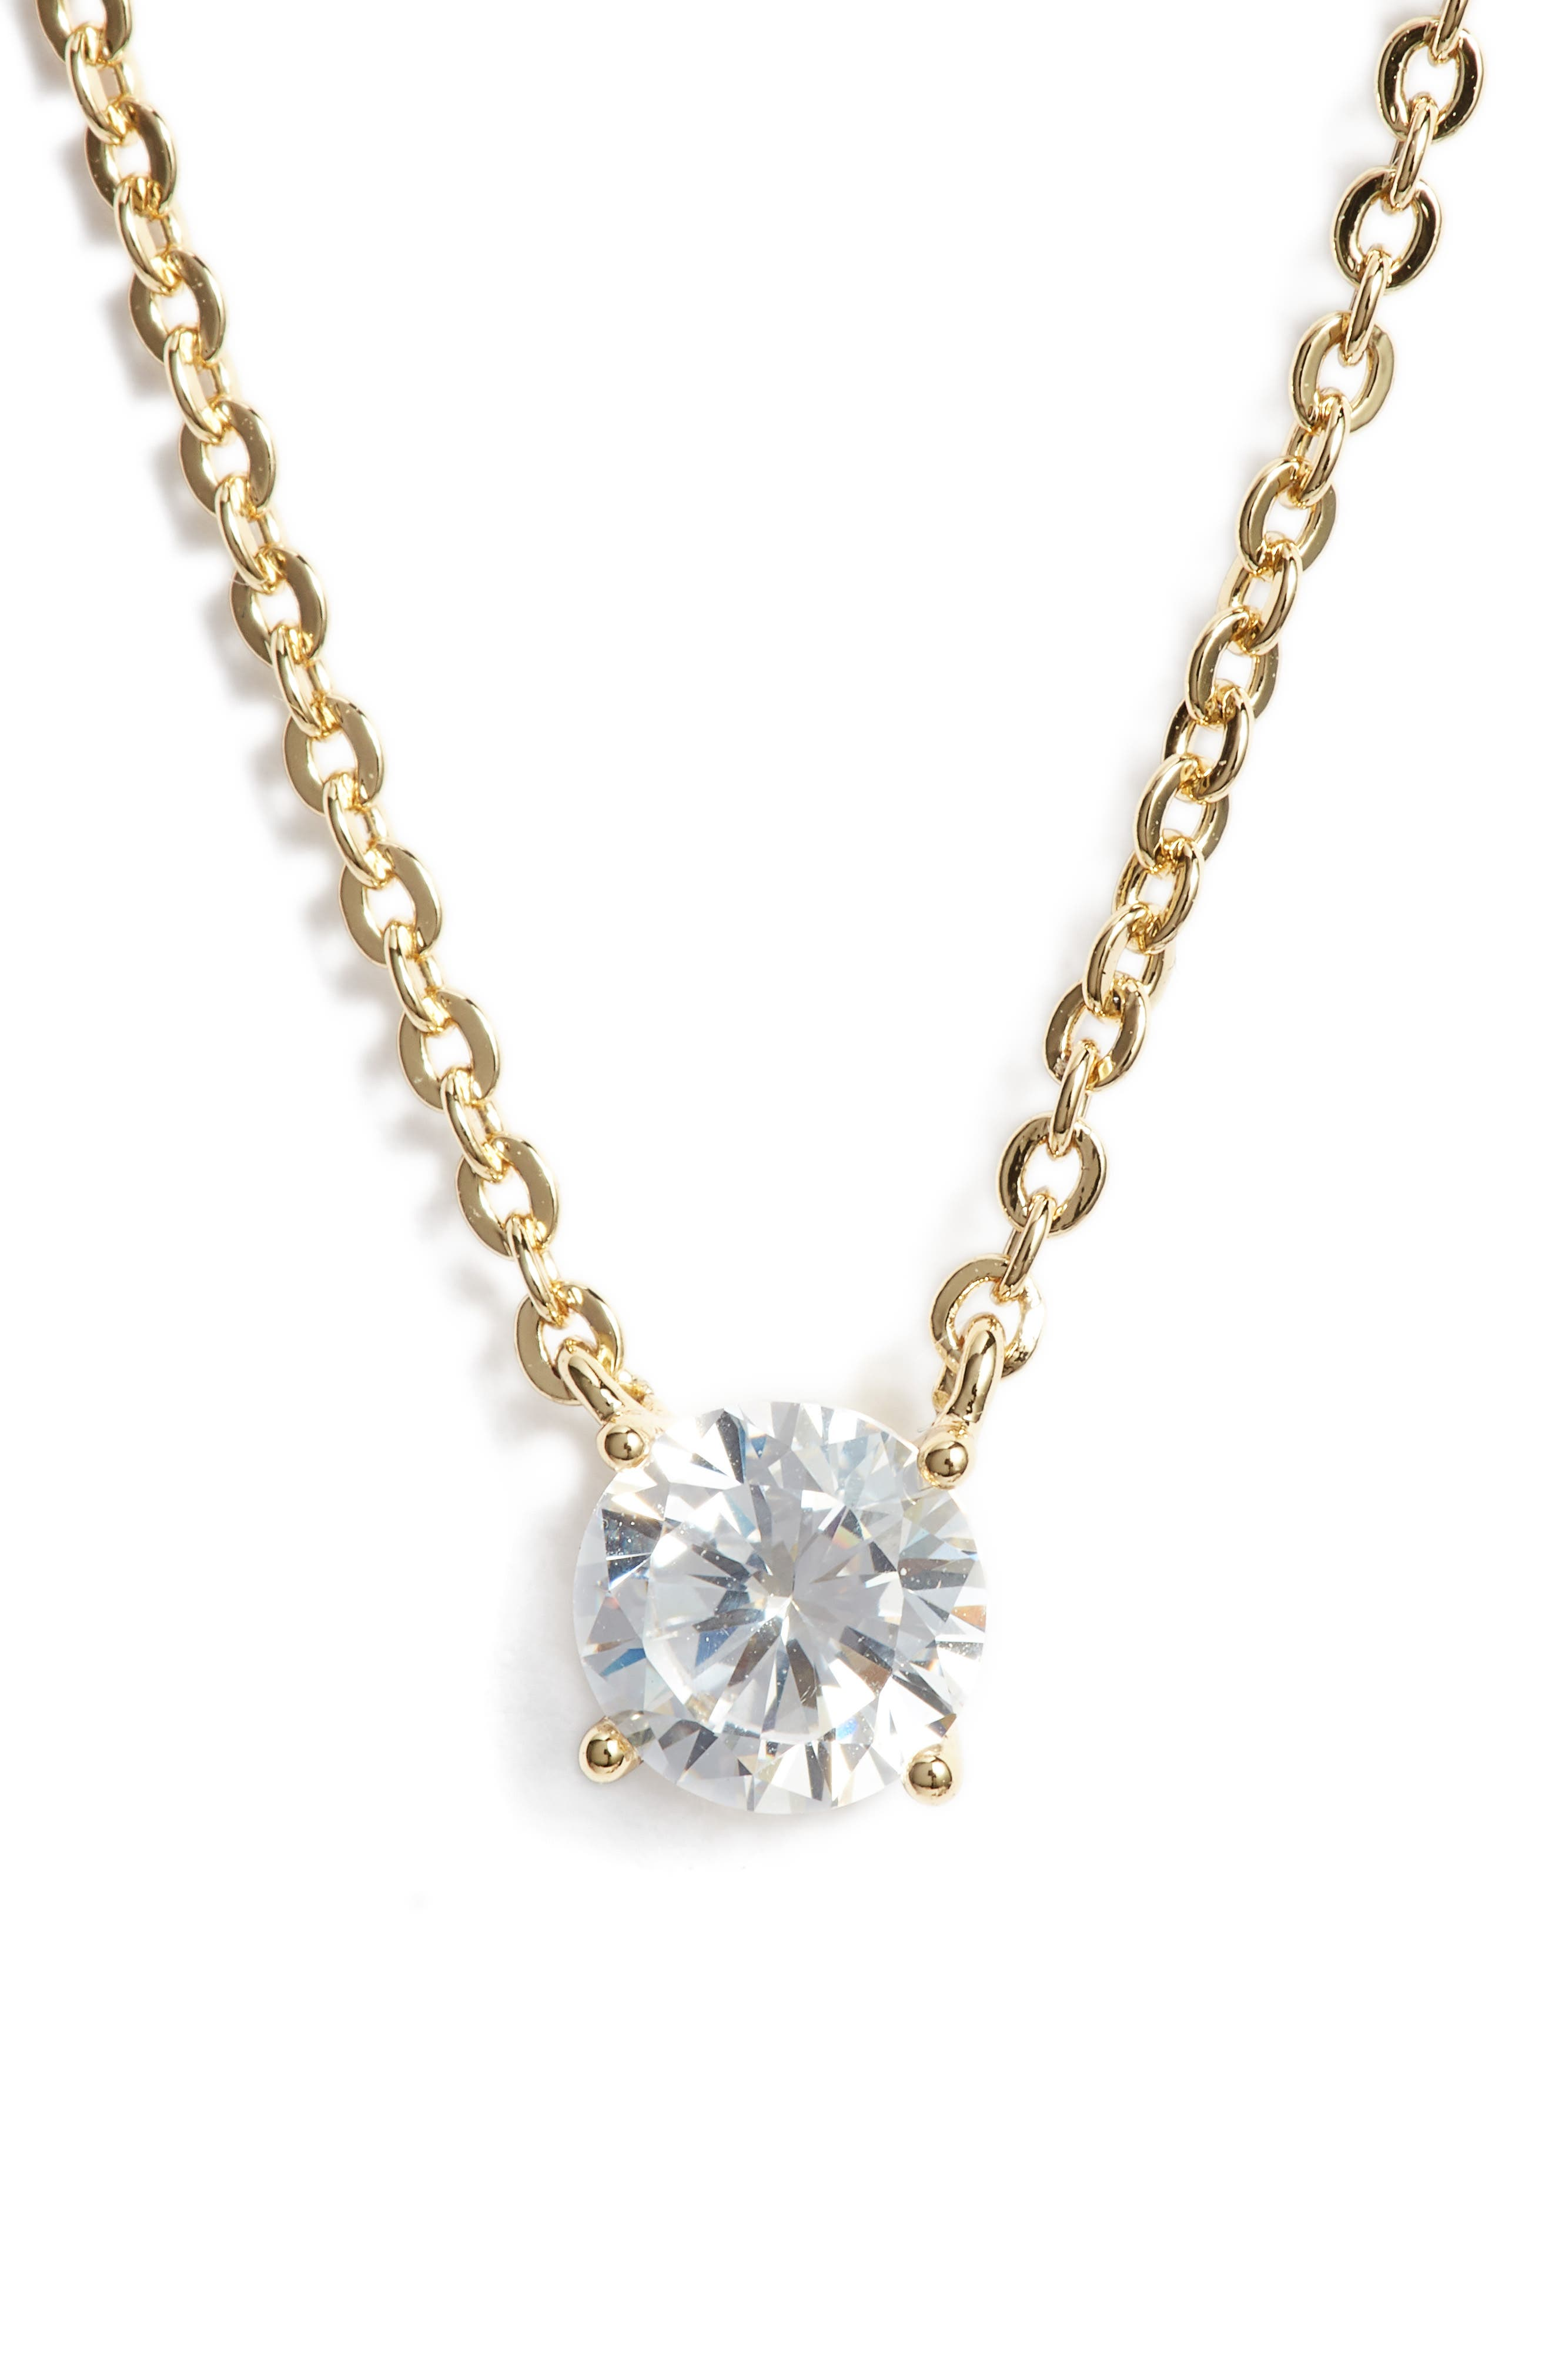 Cubic Zirconia Pendant Necklace,                             Main thumbnail 1, color,                             CLEAR- GOLD